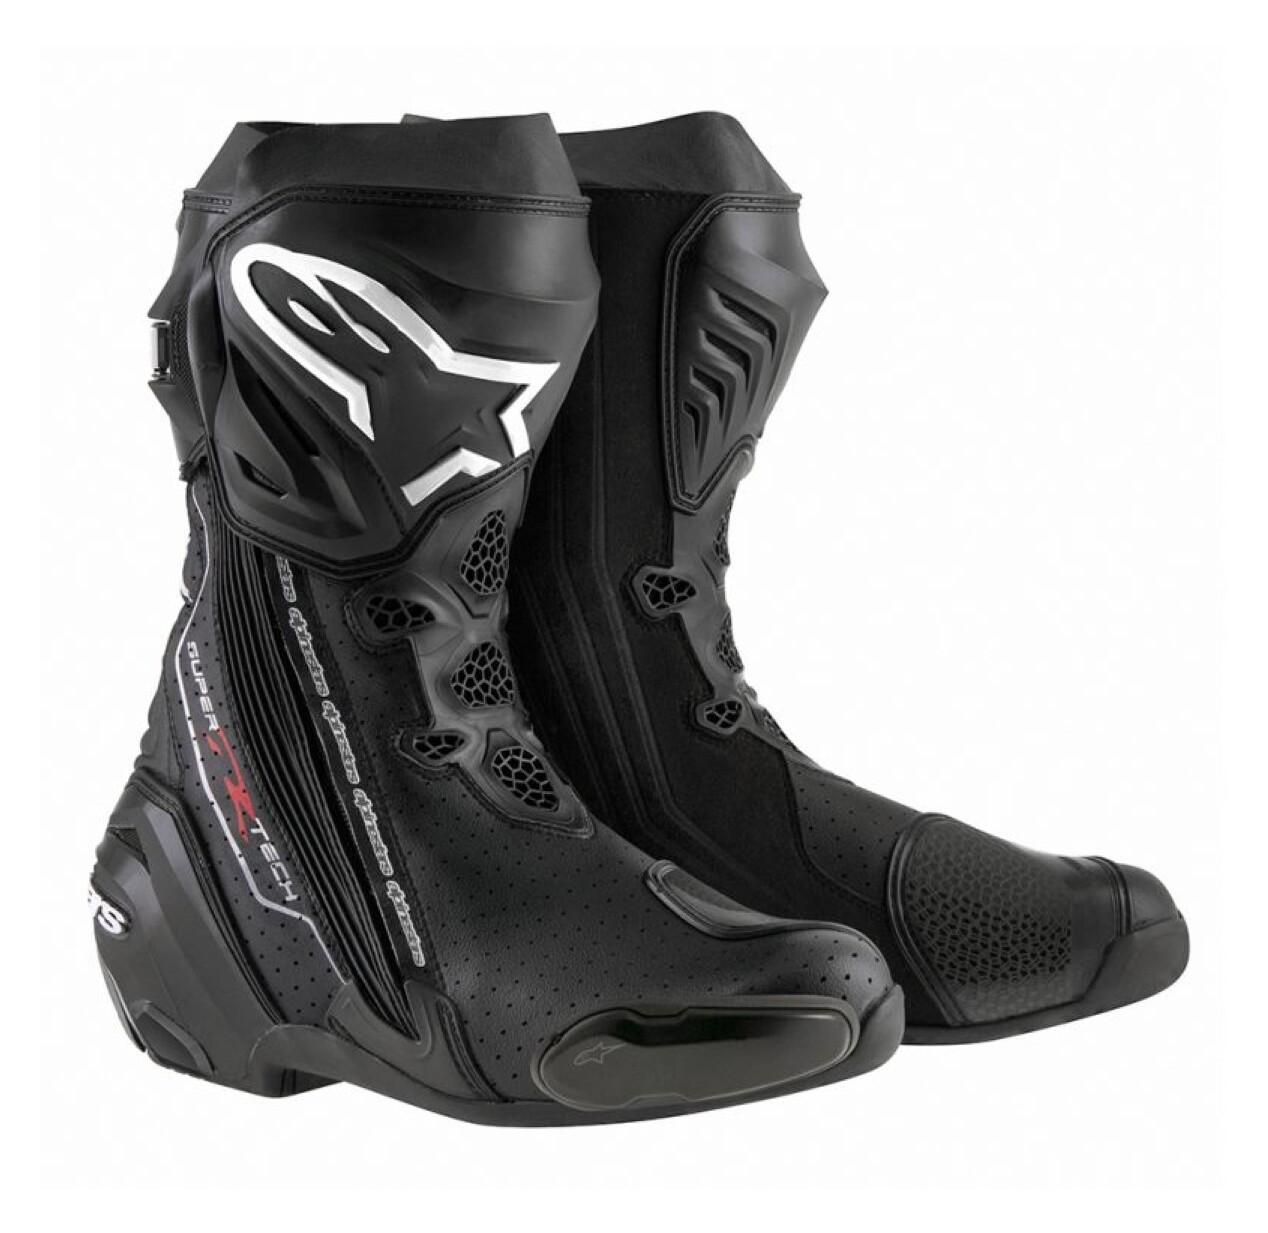 Alpinestars Supertech R Boots RevZilla